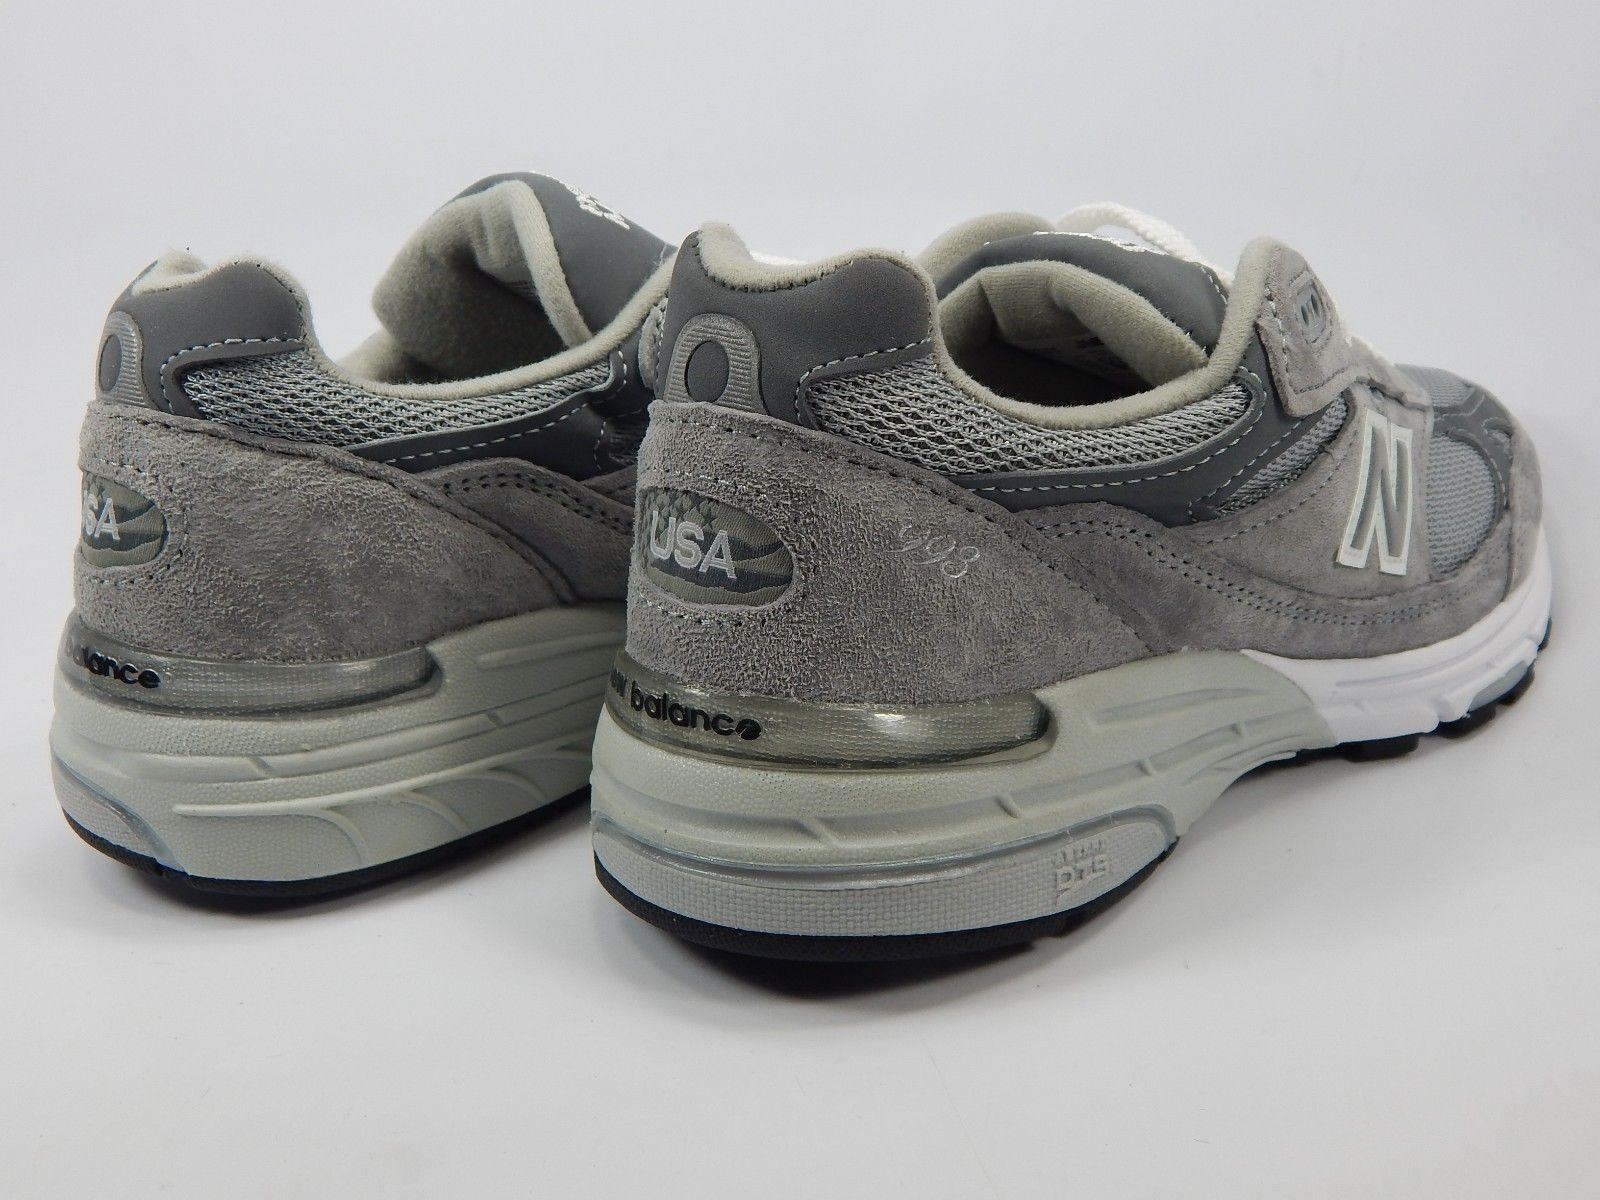 MISMATCH New Balance 993 Women's Running Shoes 6 M (B) Left & 7 M (B) Right